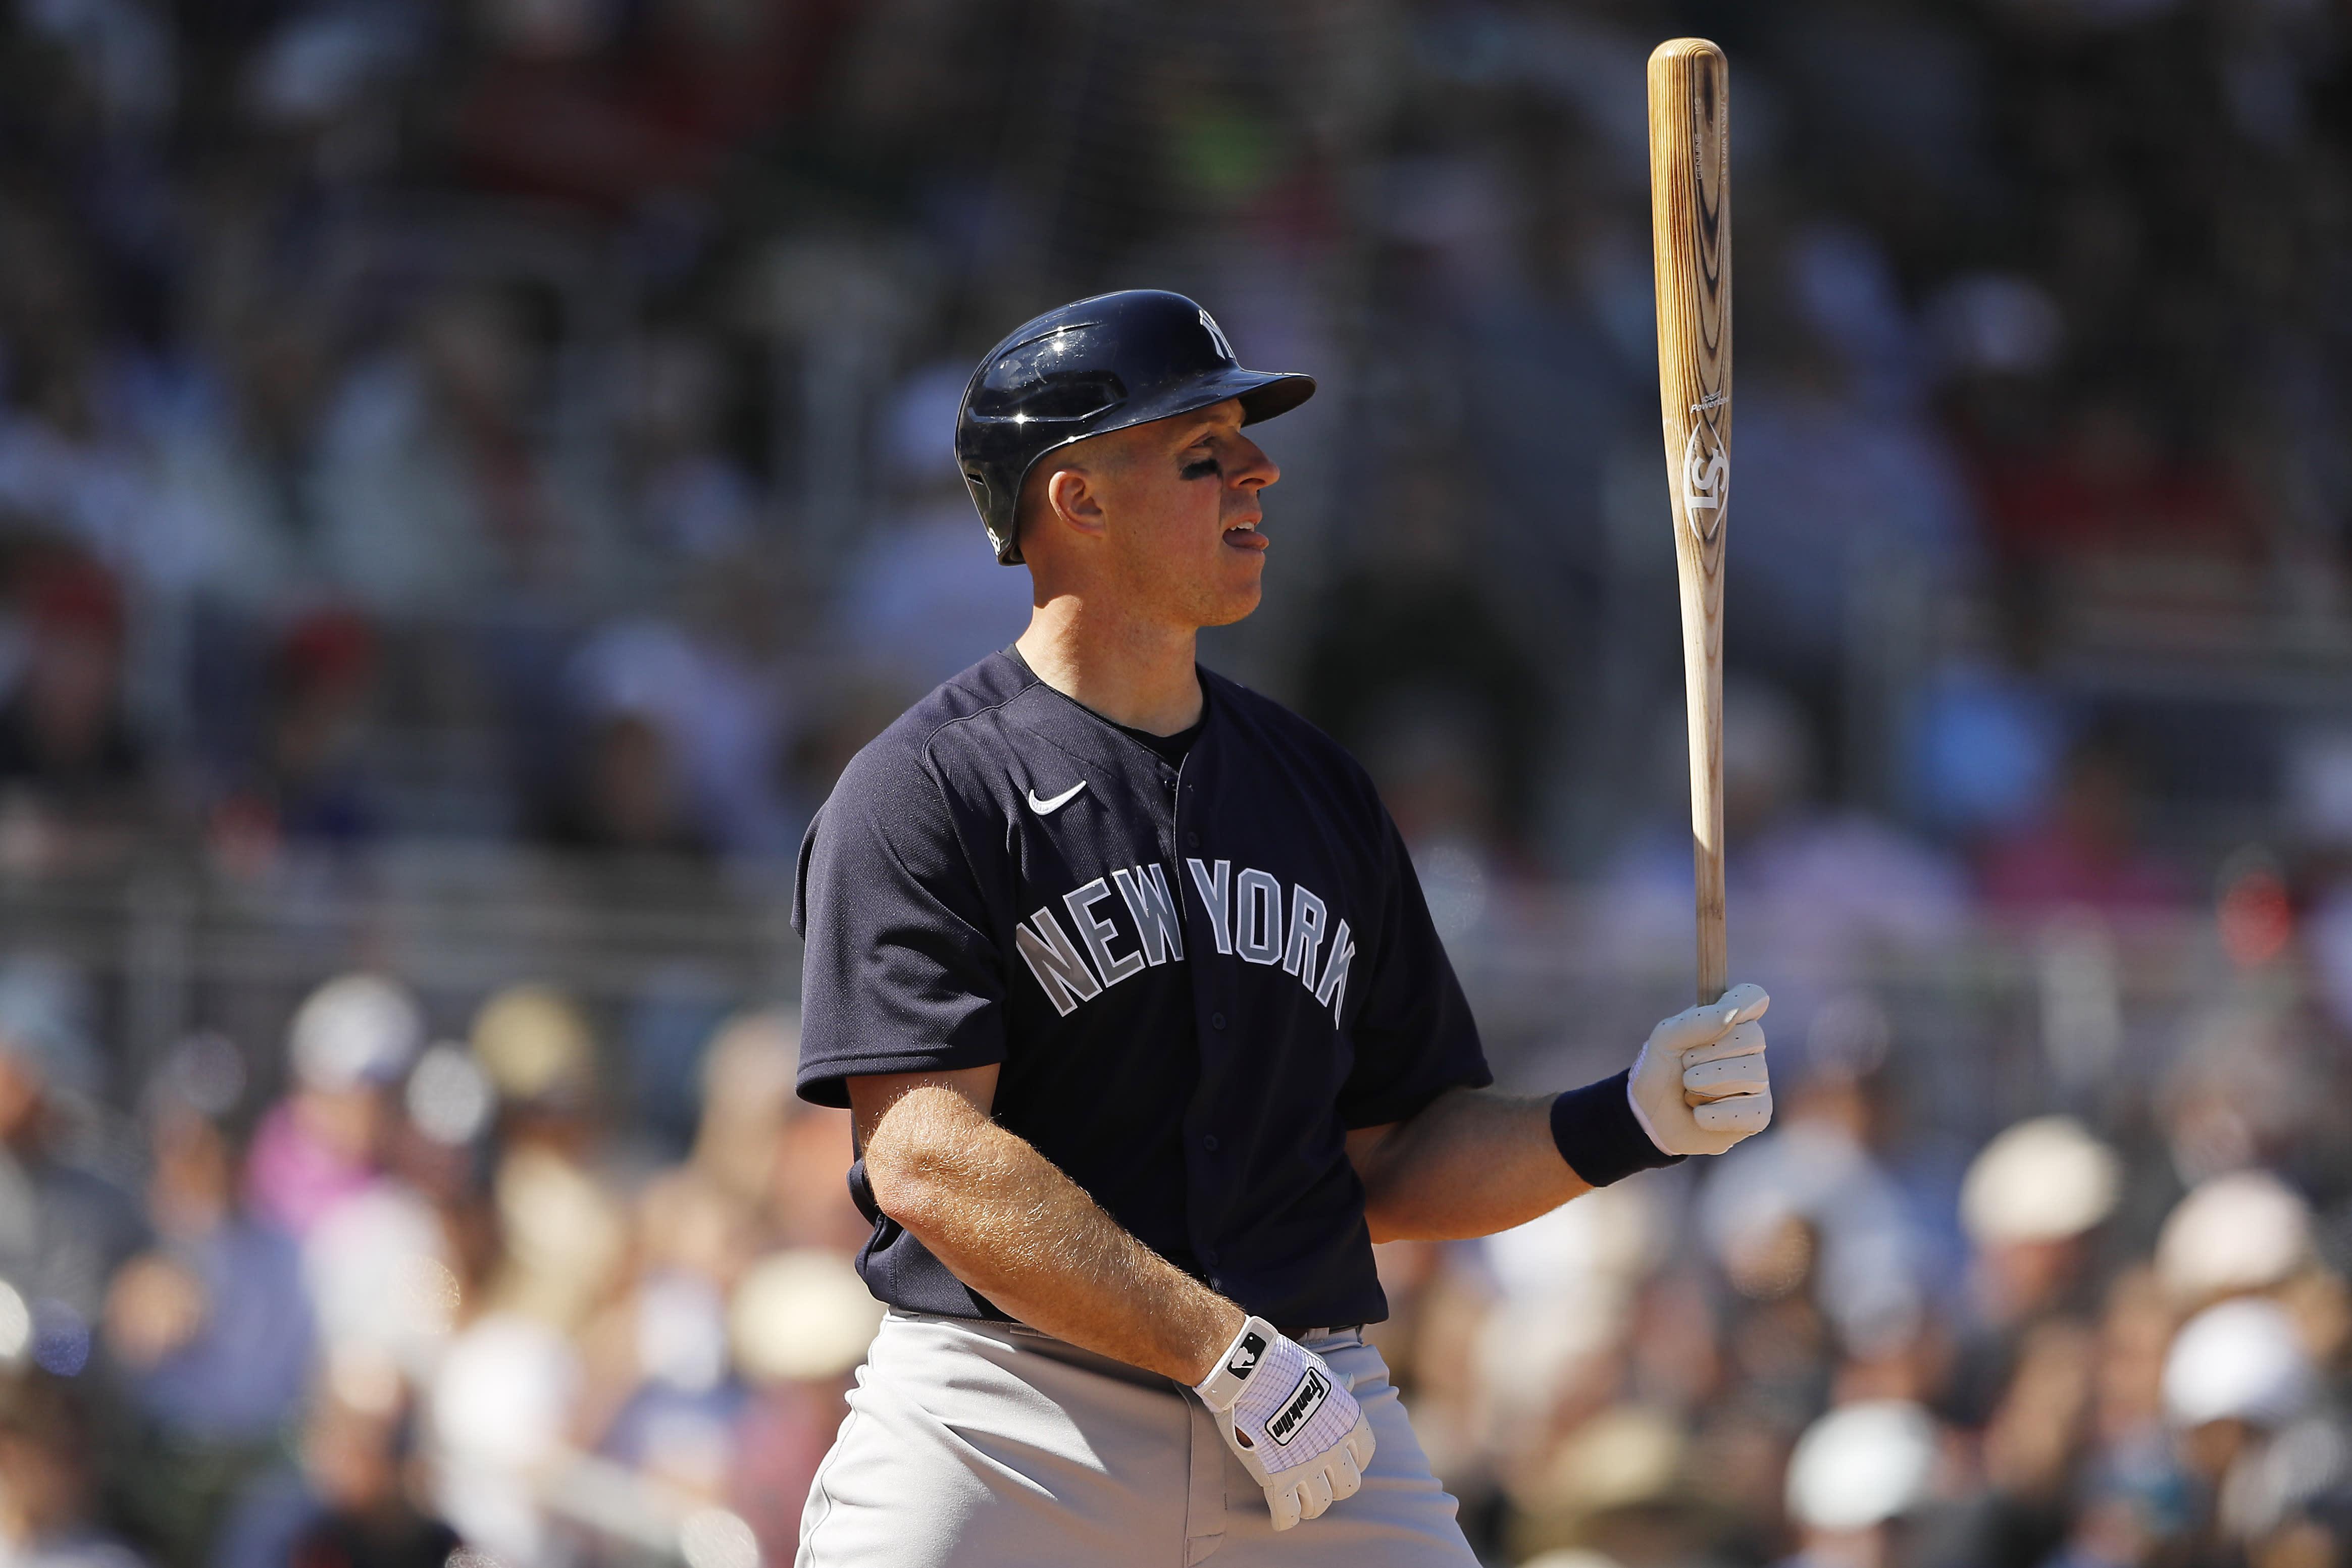 One more season? MLB veterans may have played final innings amid coronavirus uncertainty